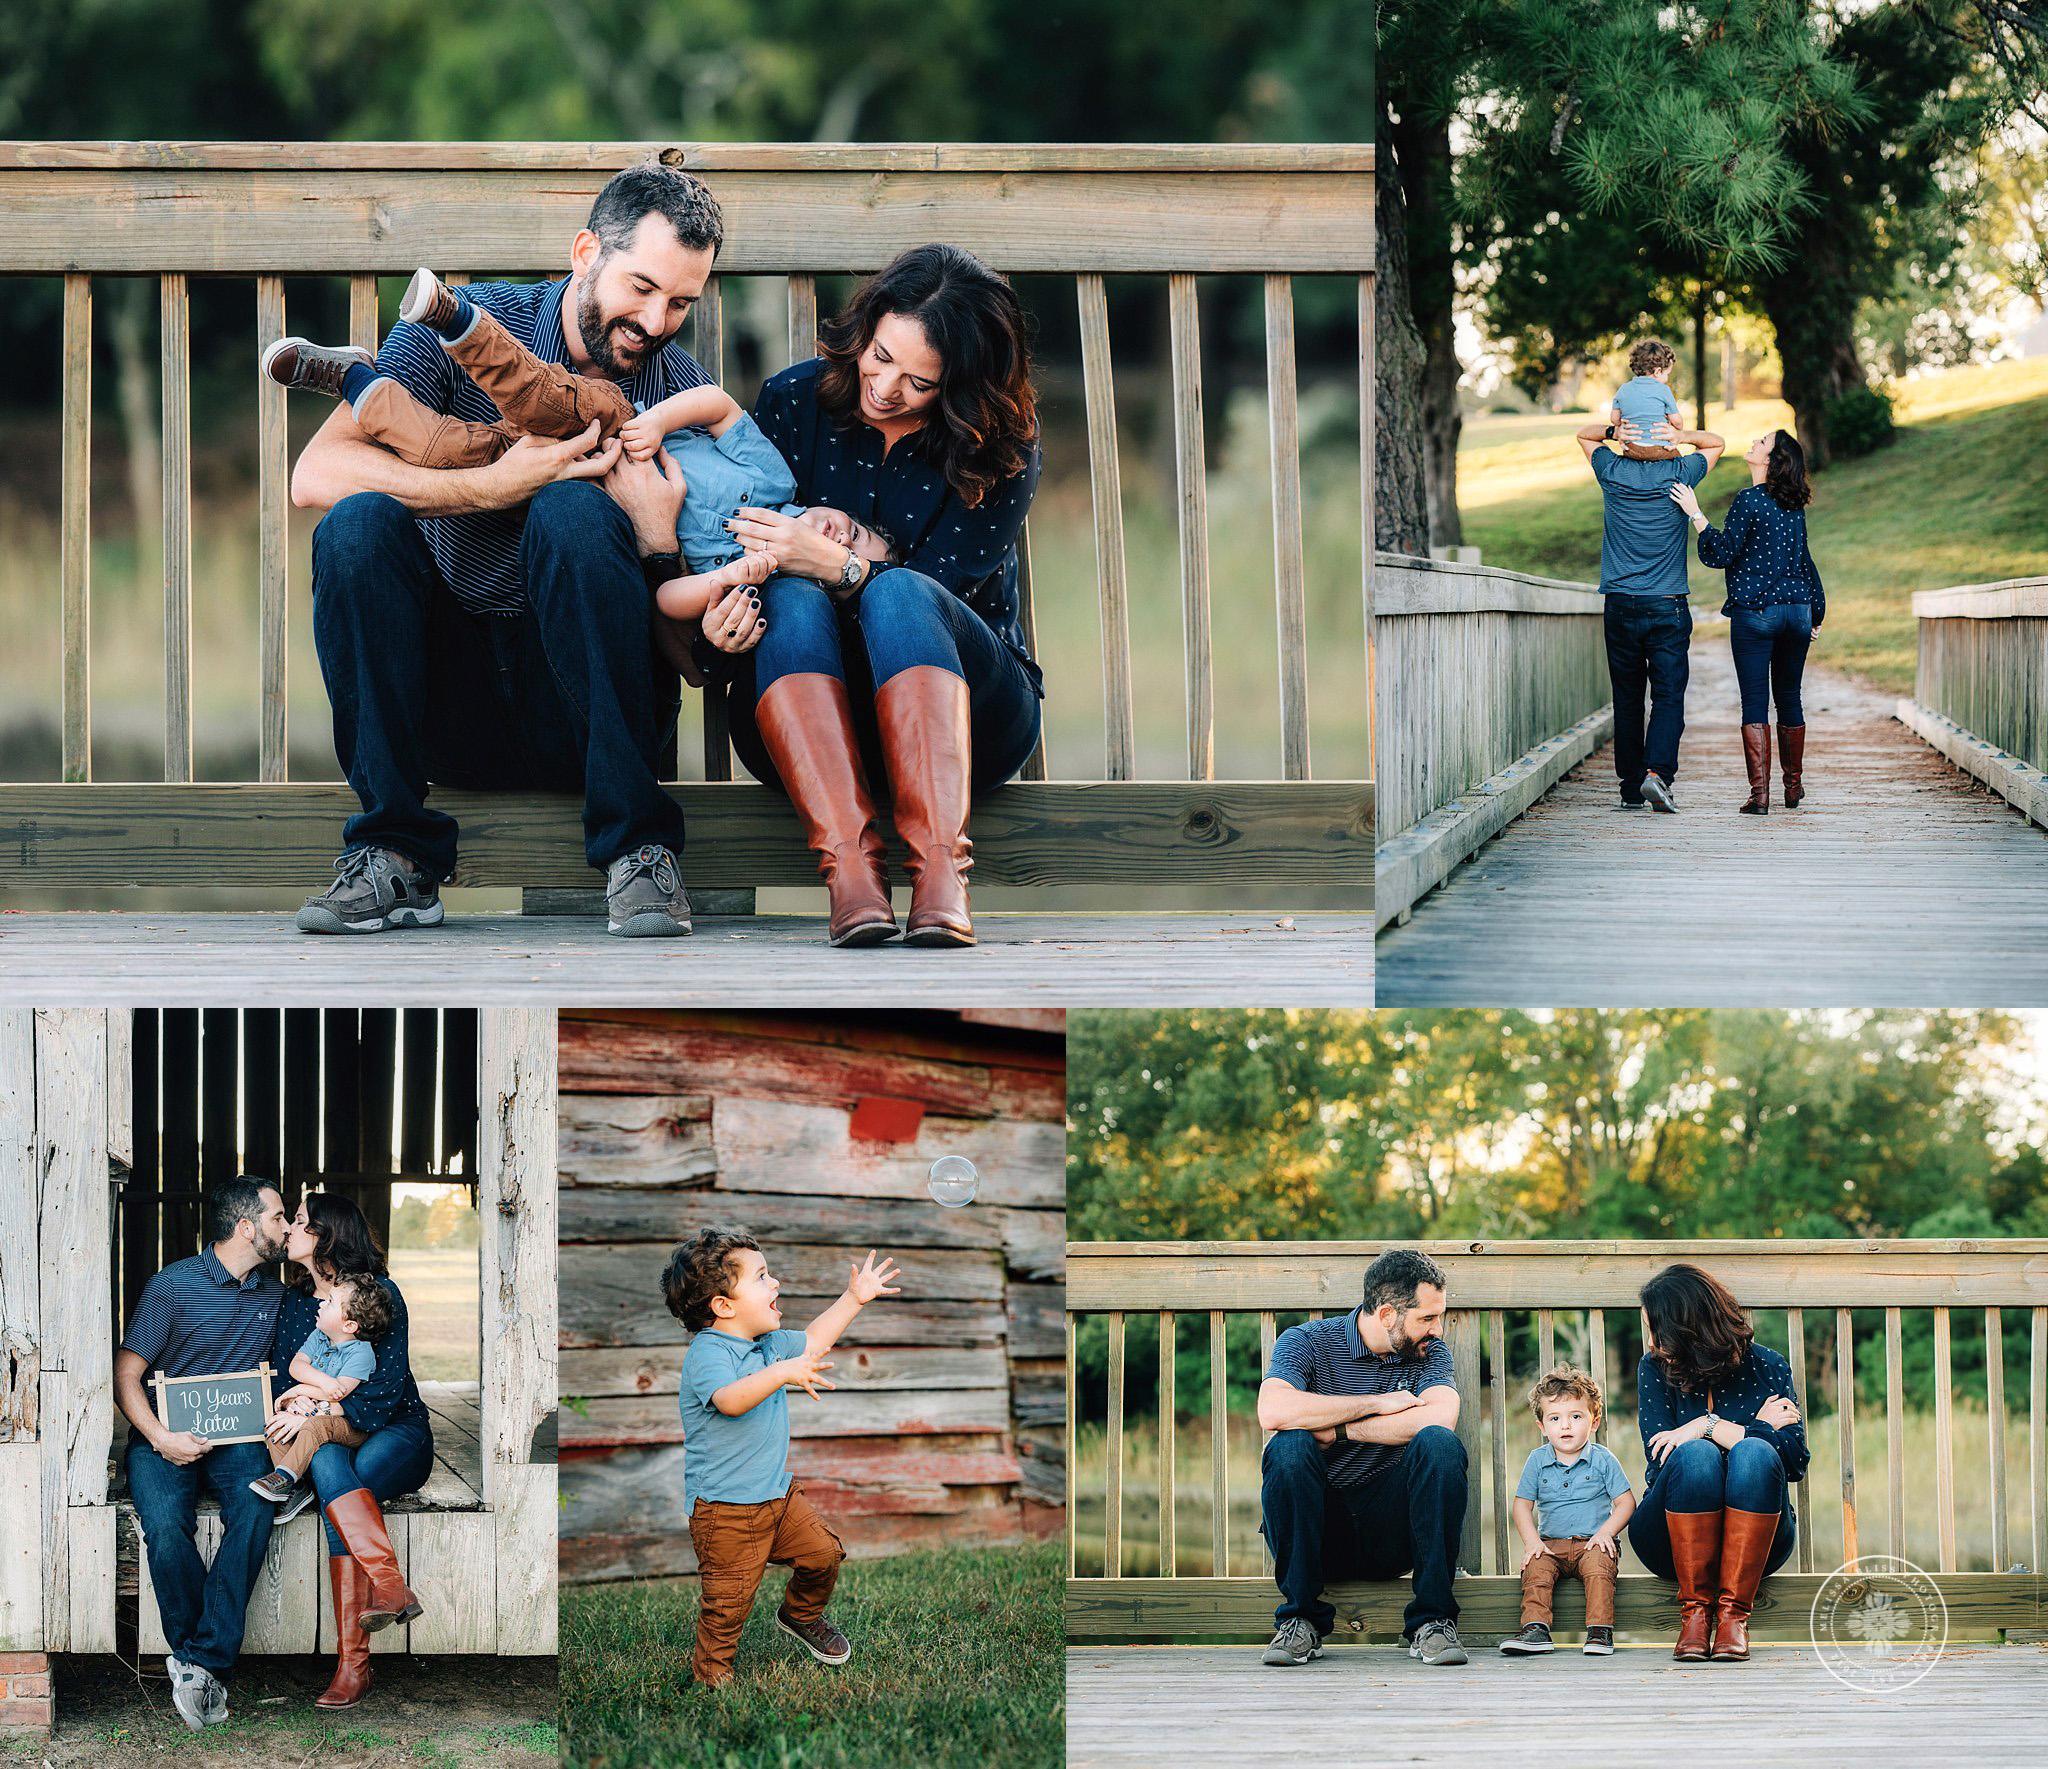 norfolk-virginia-beach-family-lifestyle-photographer-windsor-castle-park-photo-session-melissa-bliss-photography